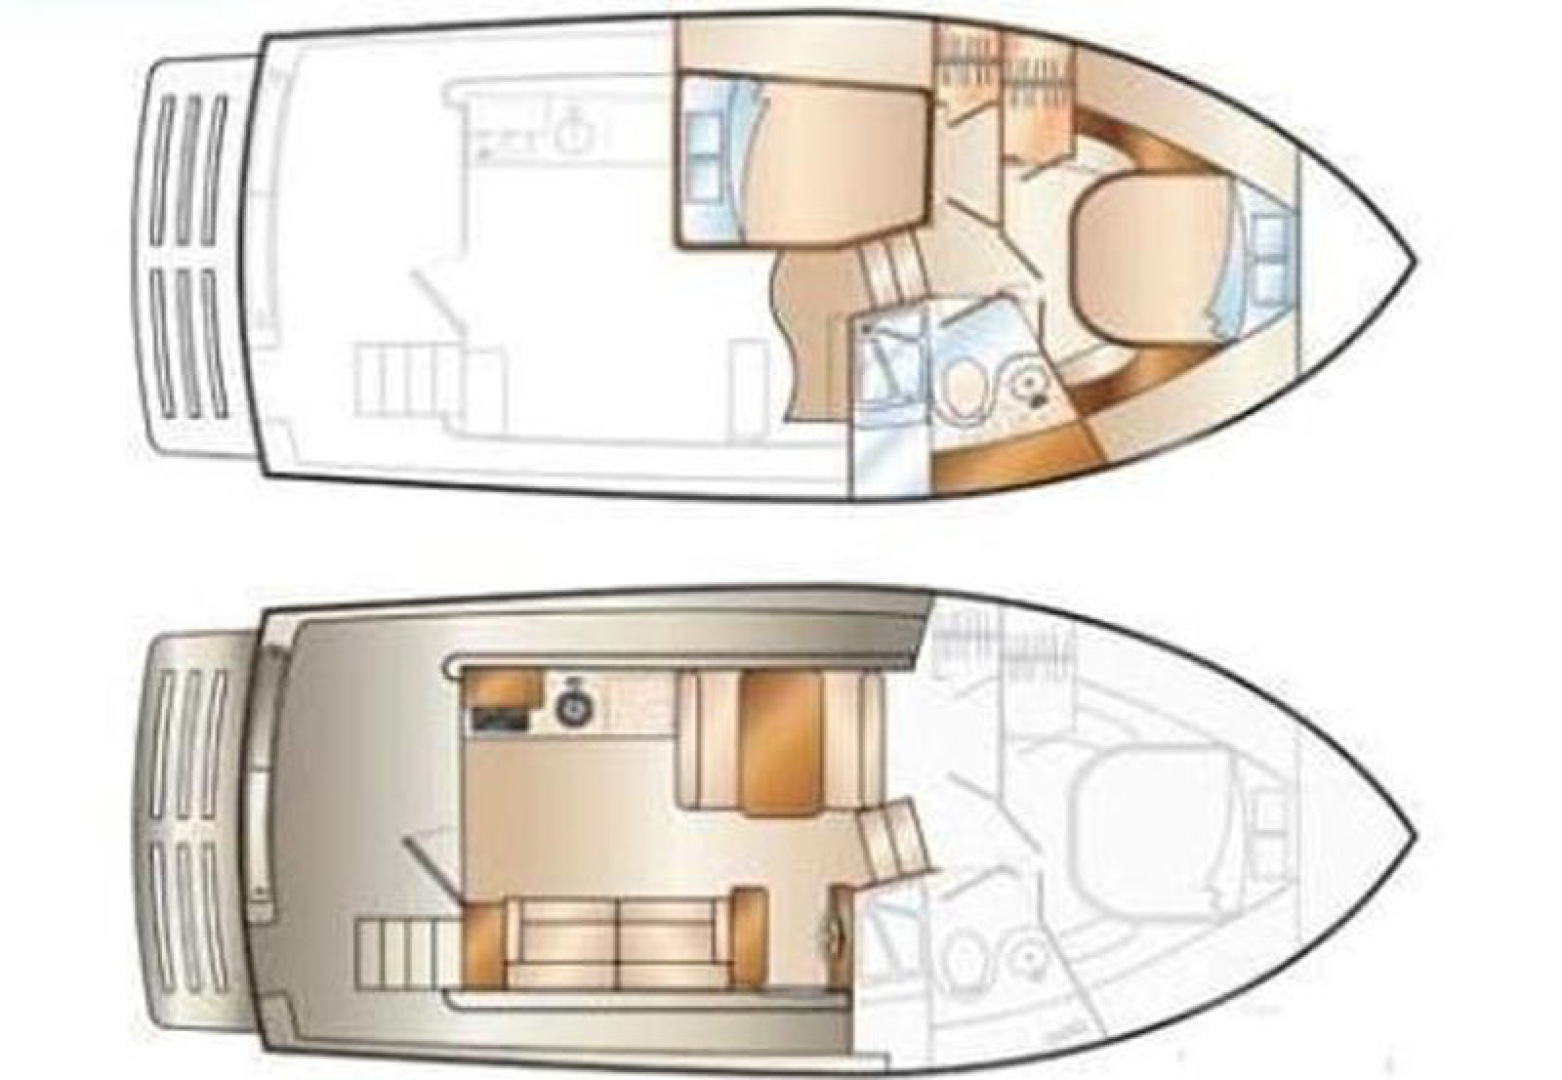 Mainship-395 Trawler 2010-Stargazer Daytona Beach-Florida-United States-Layout-1167110 | Thumbnail